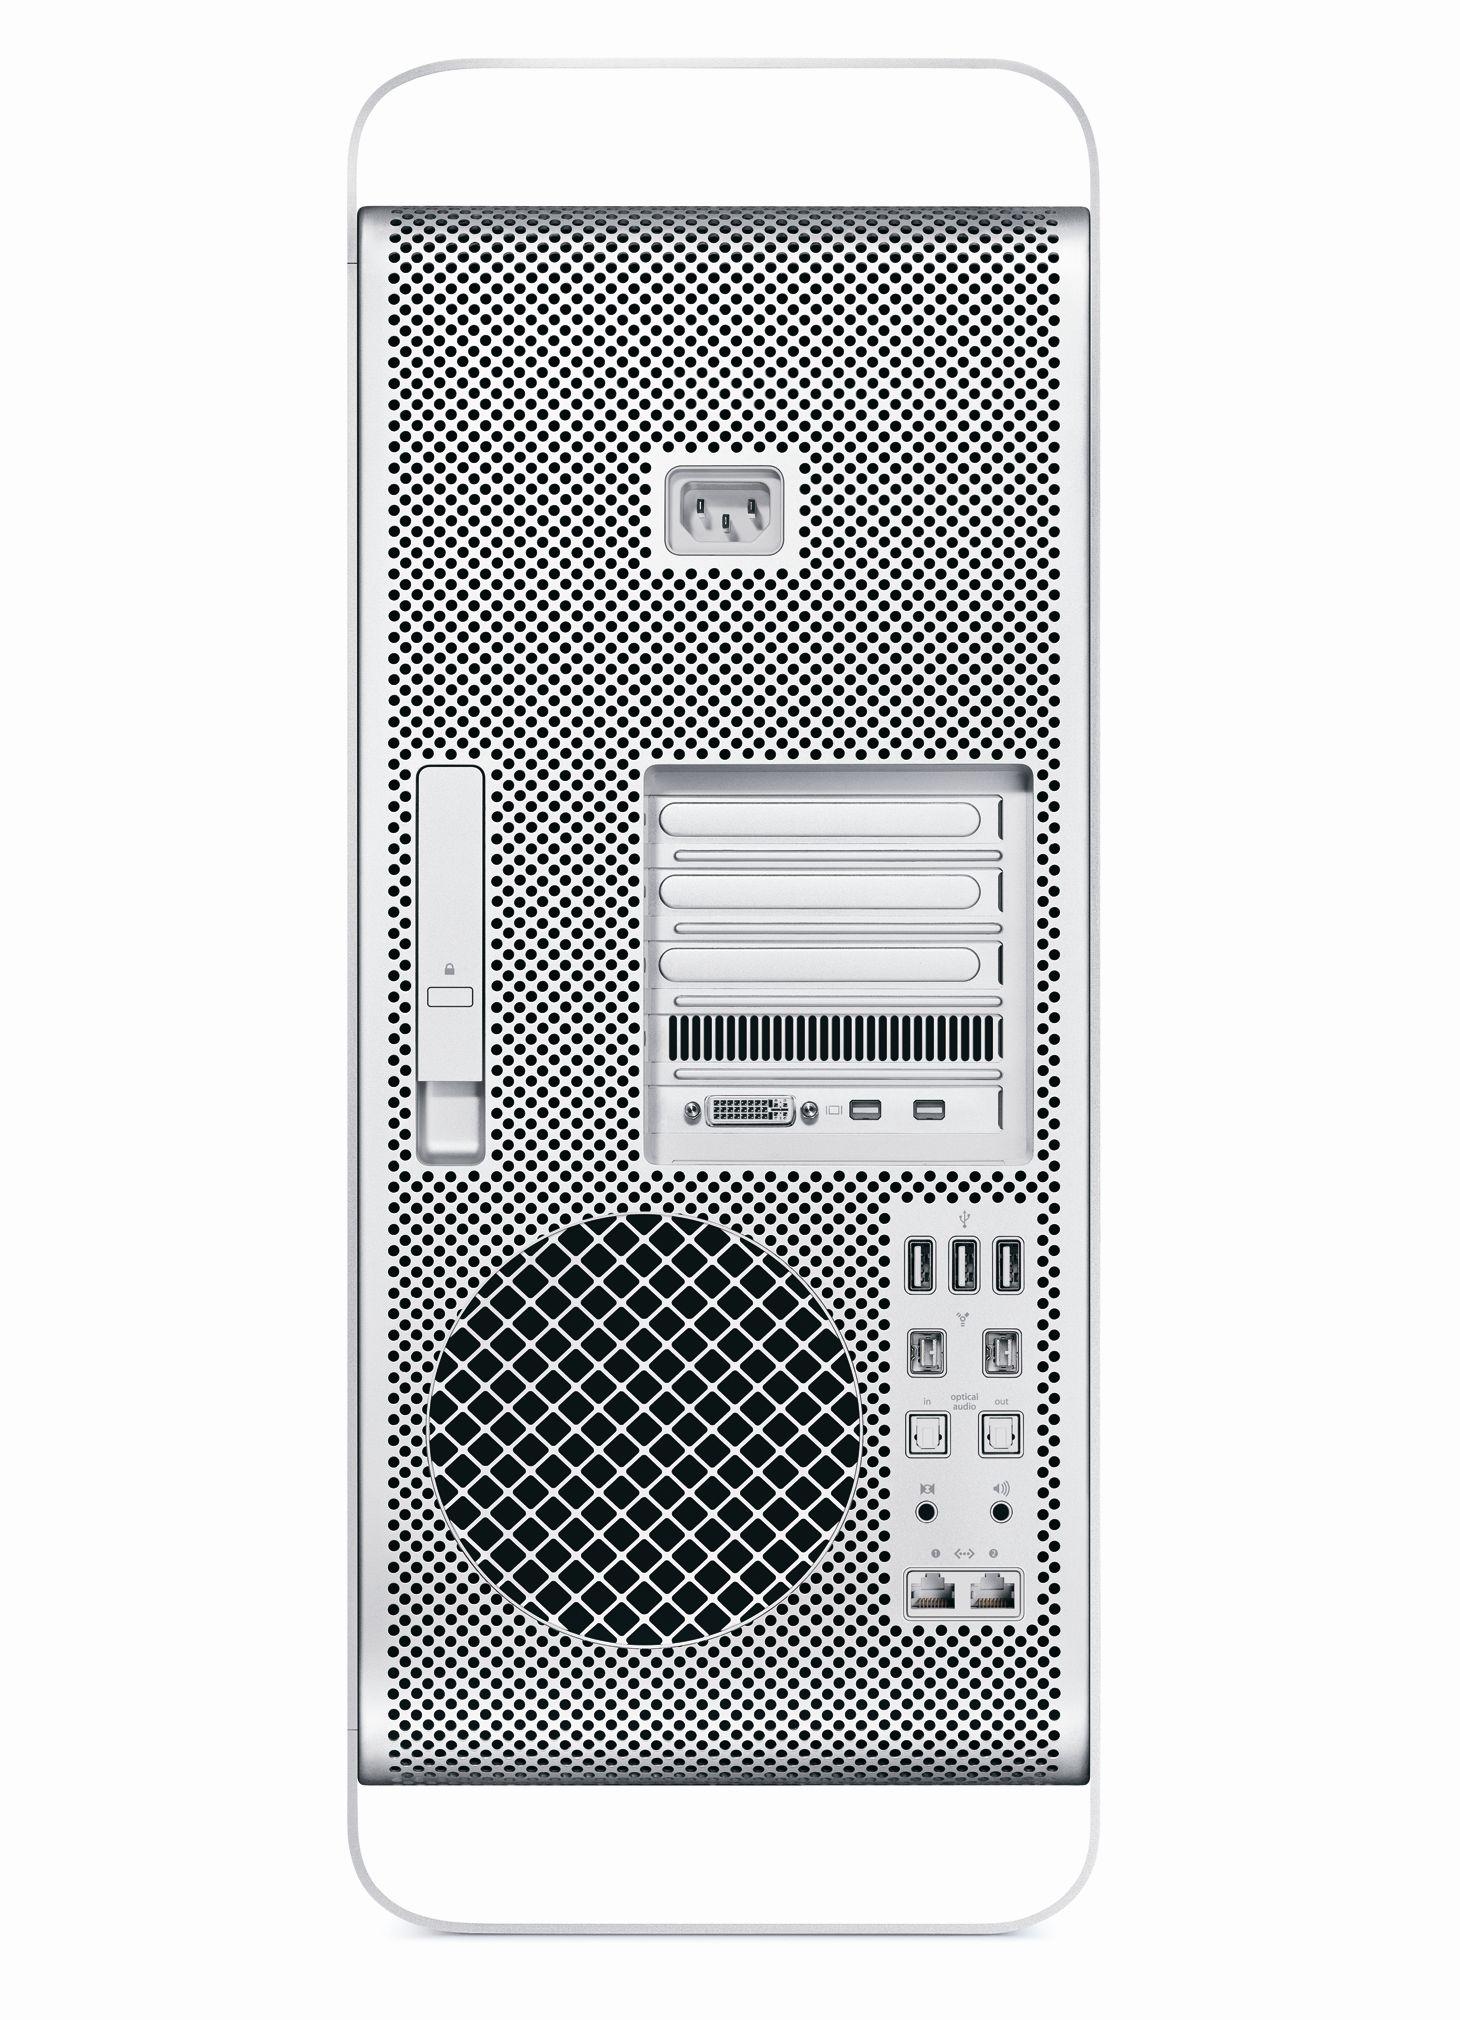 Refurbished Apple A Grade Desktop Computer Mac Pro Server 1 x 3.2GHz Quad Core Xeon W3565 (Nehalem) Processor (4 cores) (Mid 2012) MD772LL/A 8 GB DDR4 1 TB HDD Sierra 10.12 Includes Keyboard & Mouse 2